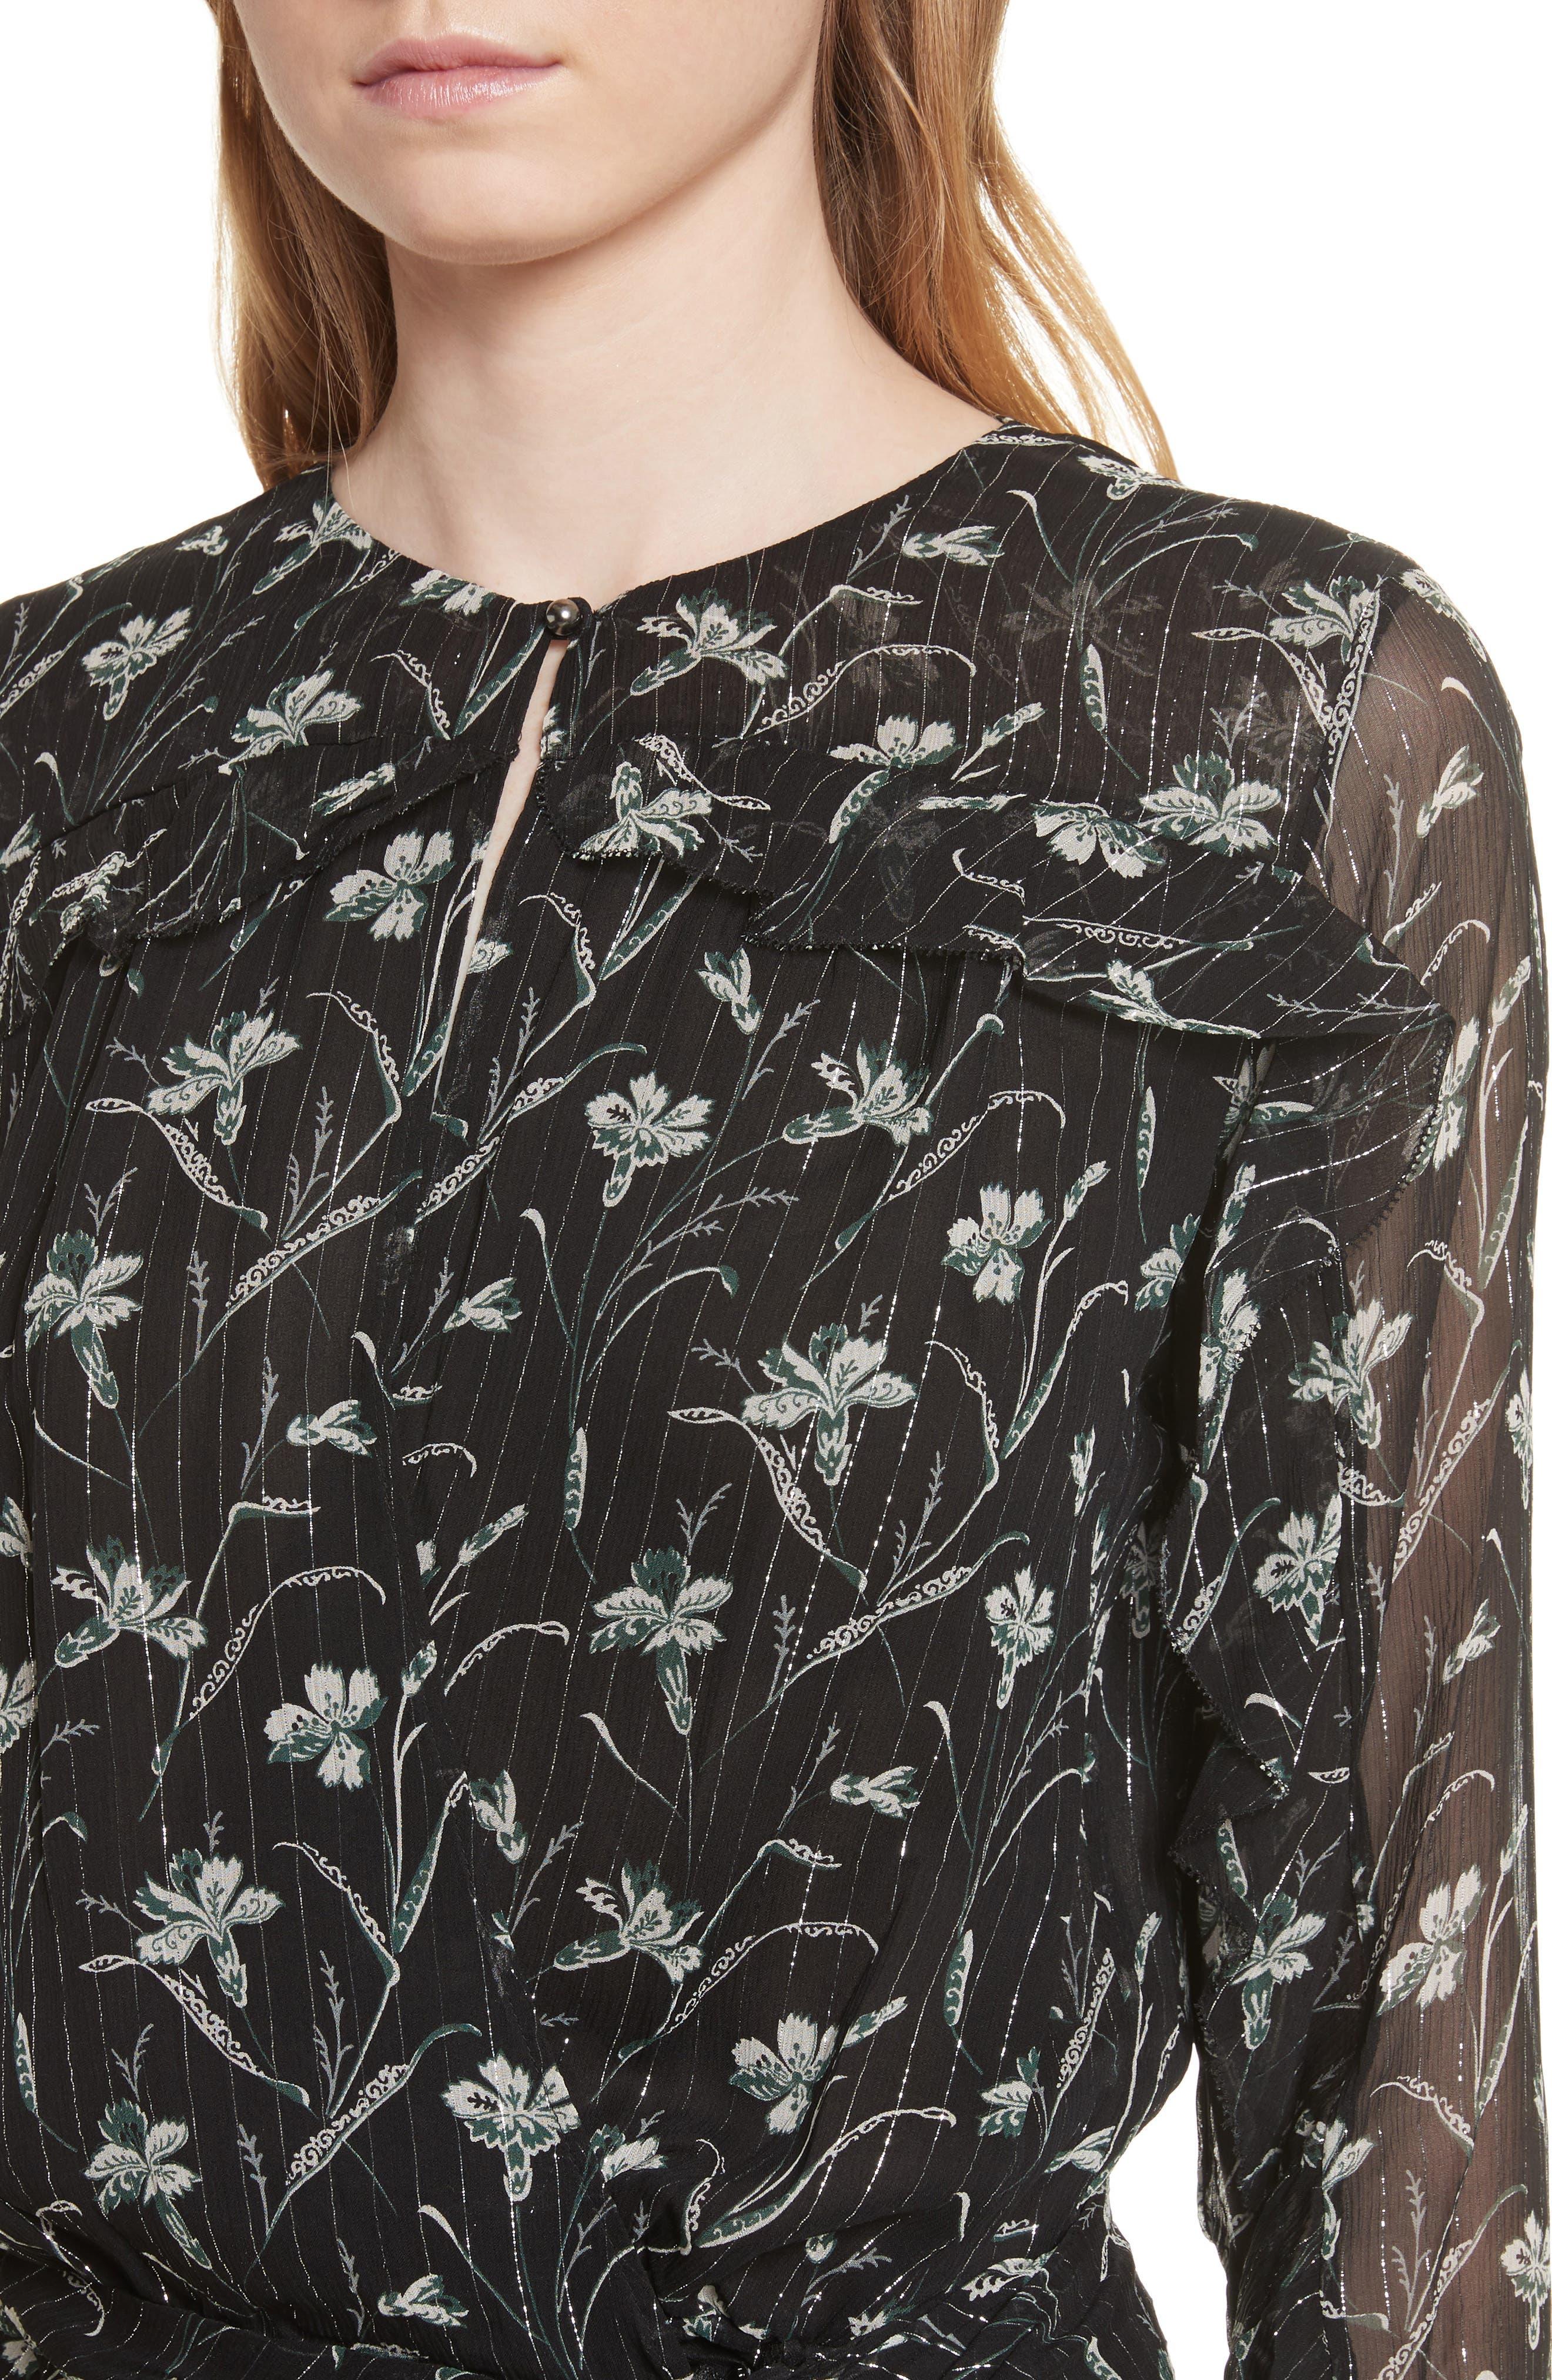 Fitzgerald Floral Print Metallic Chiffon Dress,                             Alternate thumbnail 4, color,                             Green/ Black